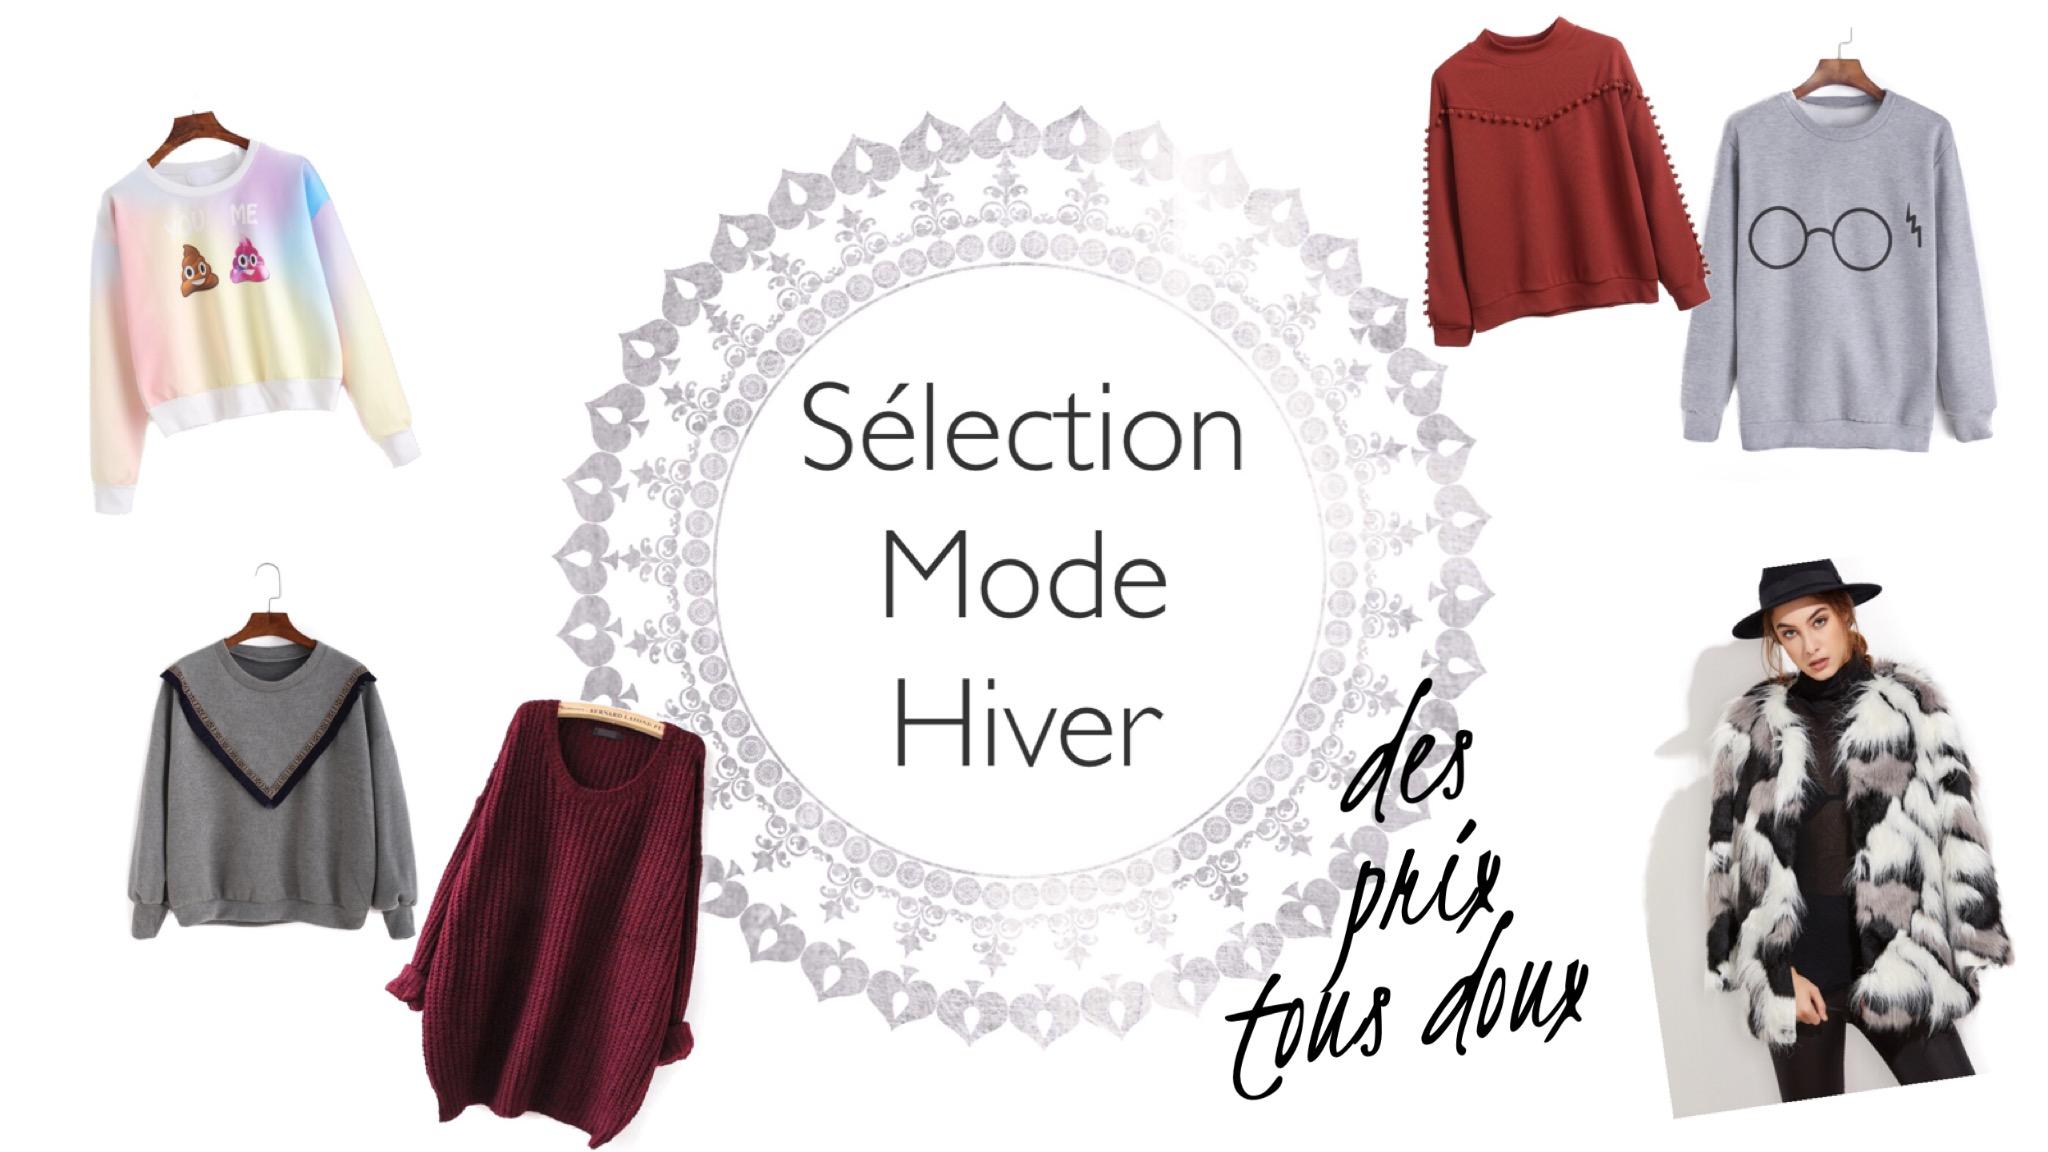 selection-mode-hiver-petits-prix-pulls-manteaux-sweats